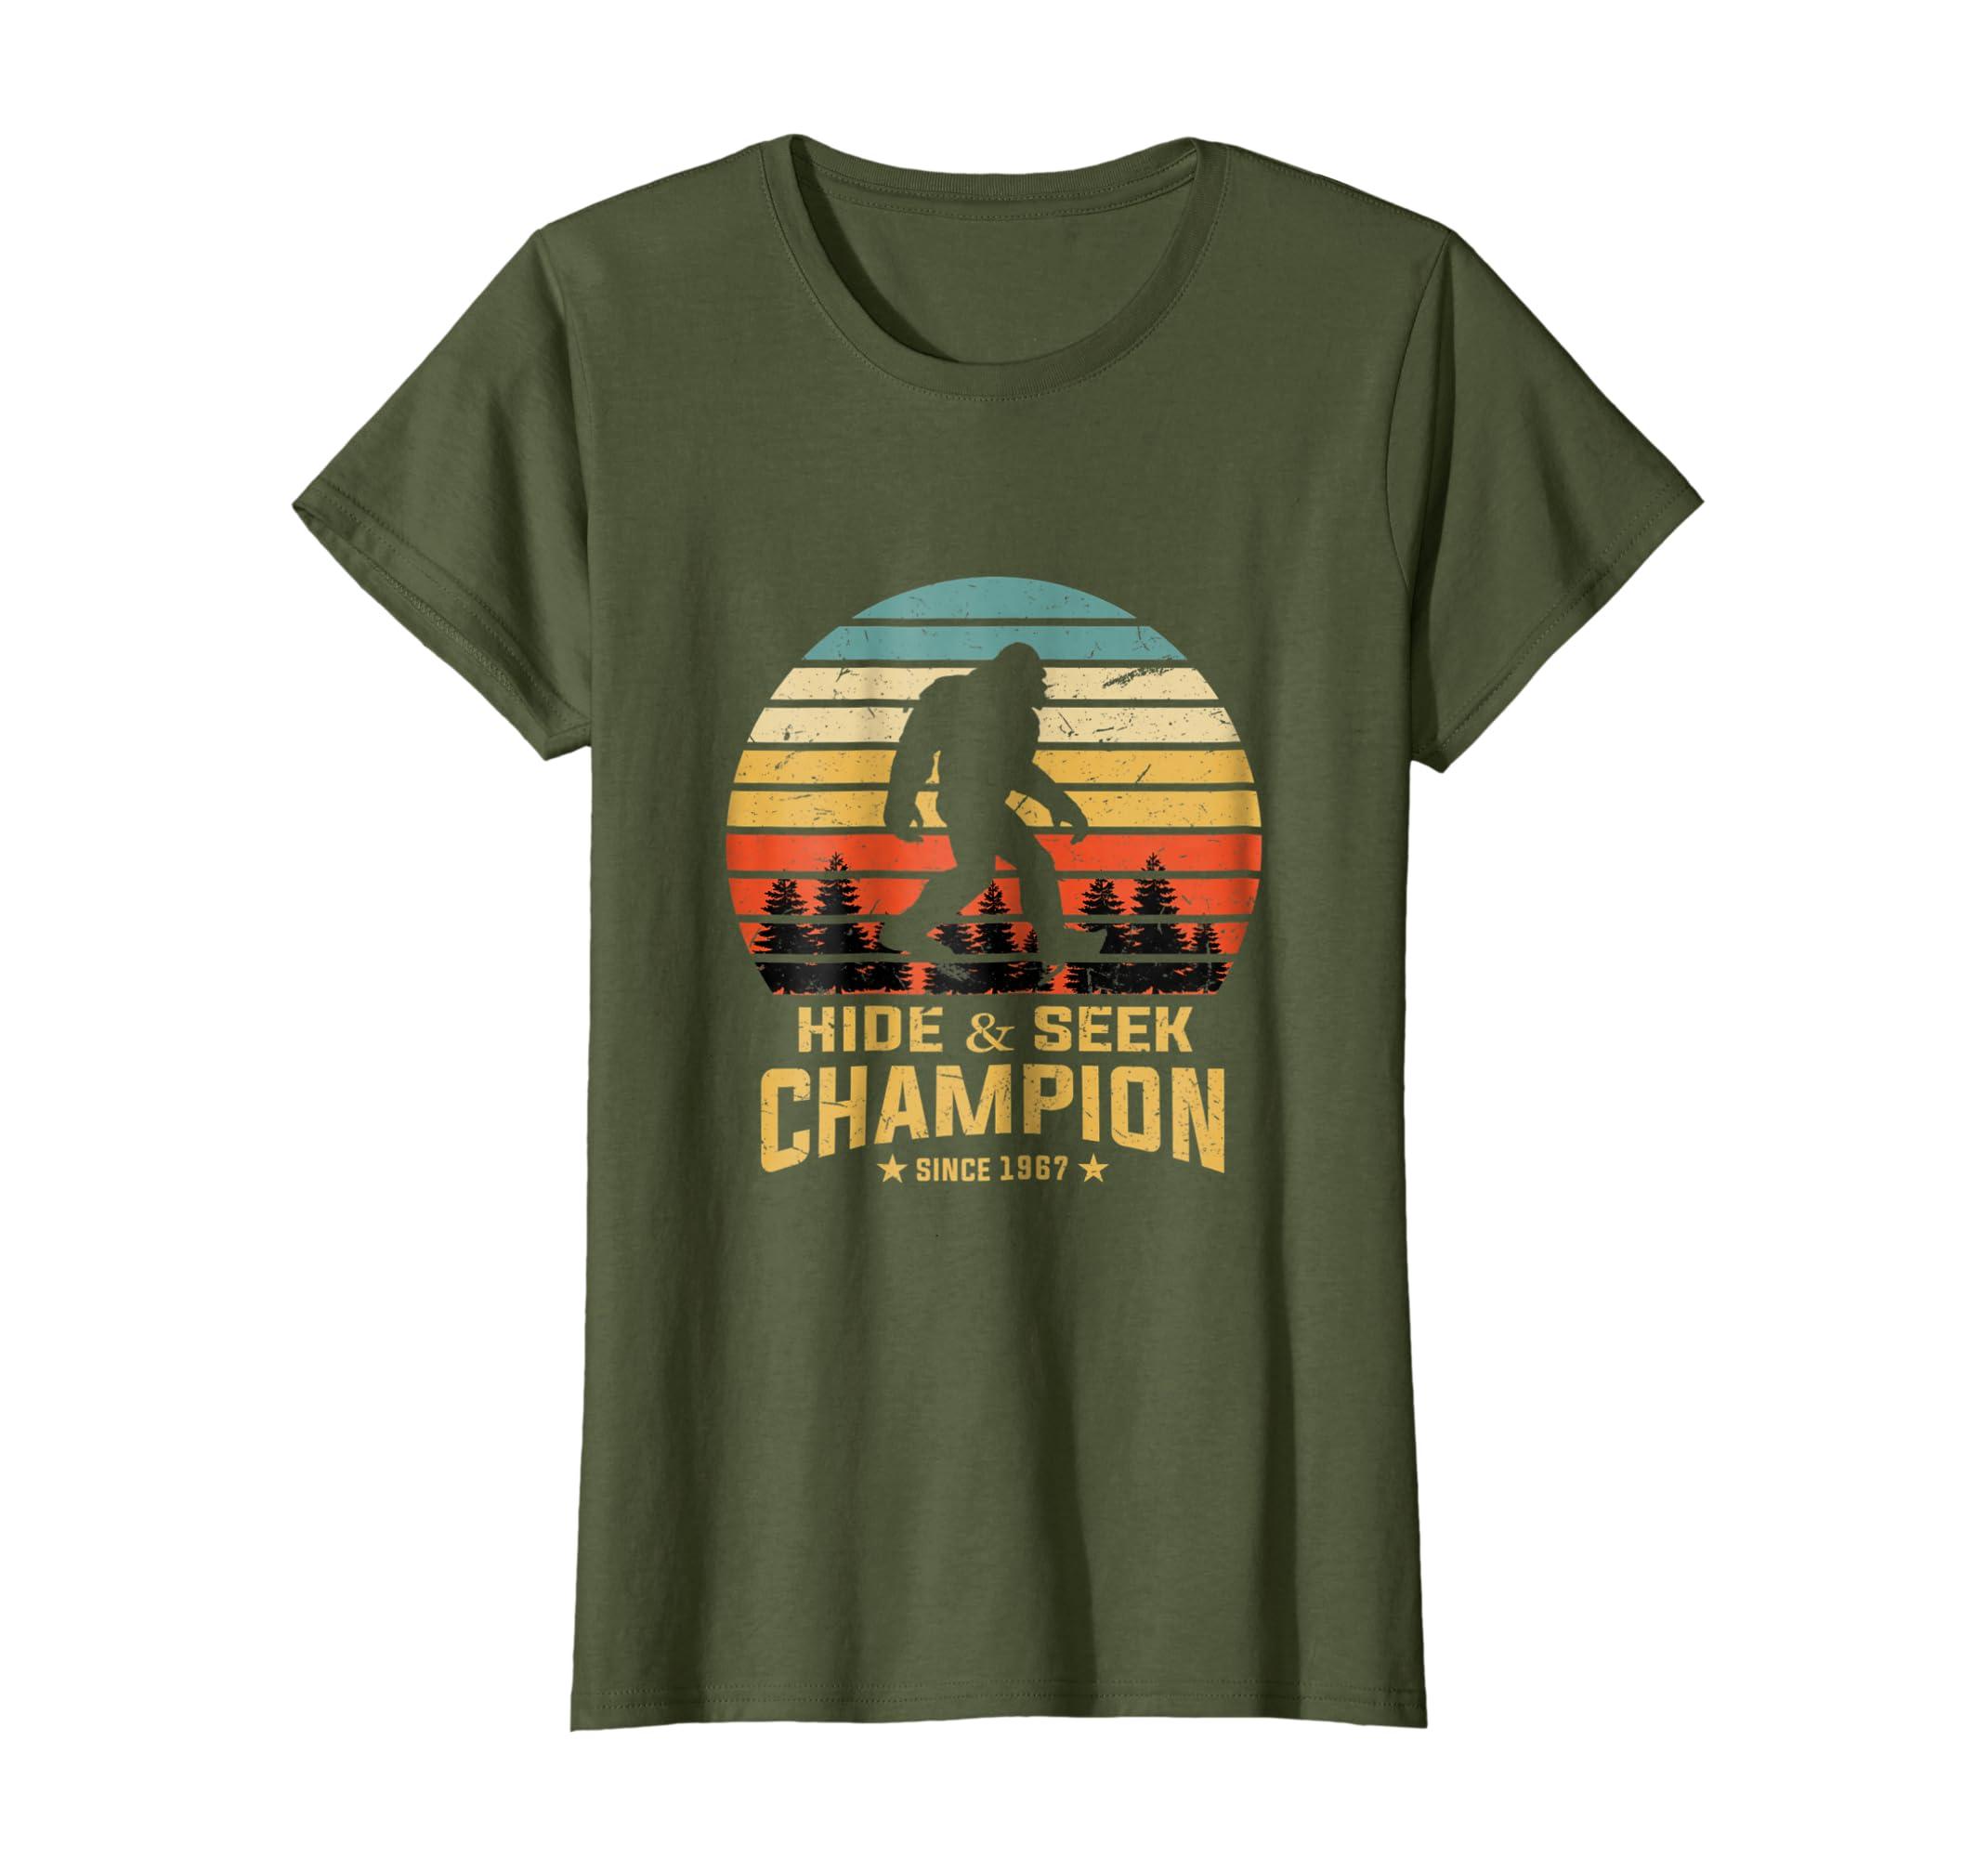 2aa680e8 Amazon.com: Hide and Seek World Champion T-Shirt Bigfoot Retro Vintage:  Clothing